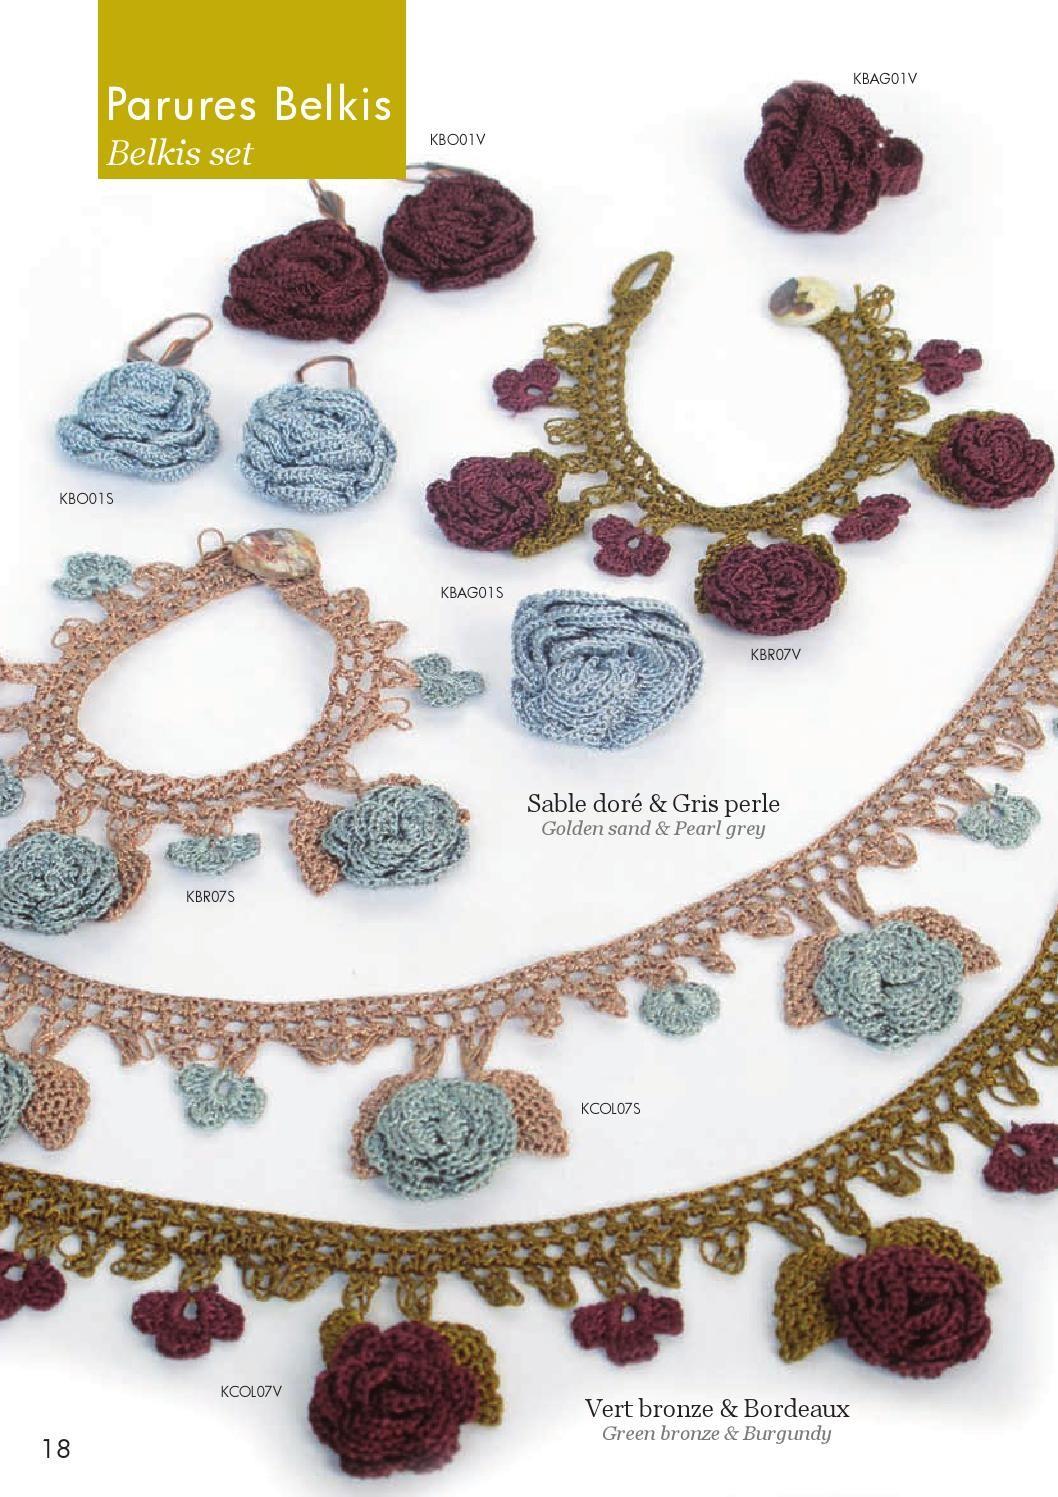 Modelos de Bisuteria Bijoux oya | todo tejidos | Pinterest | Crochet ...